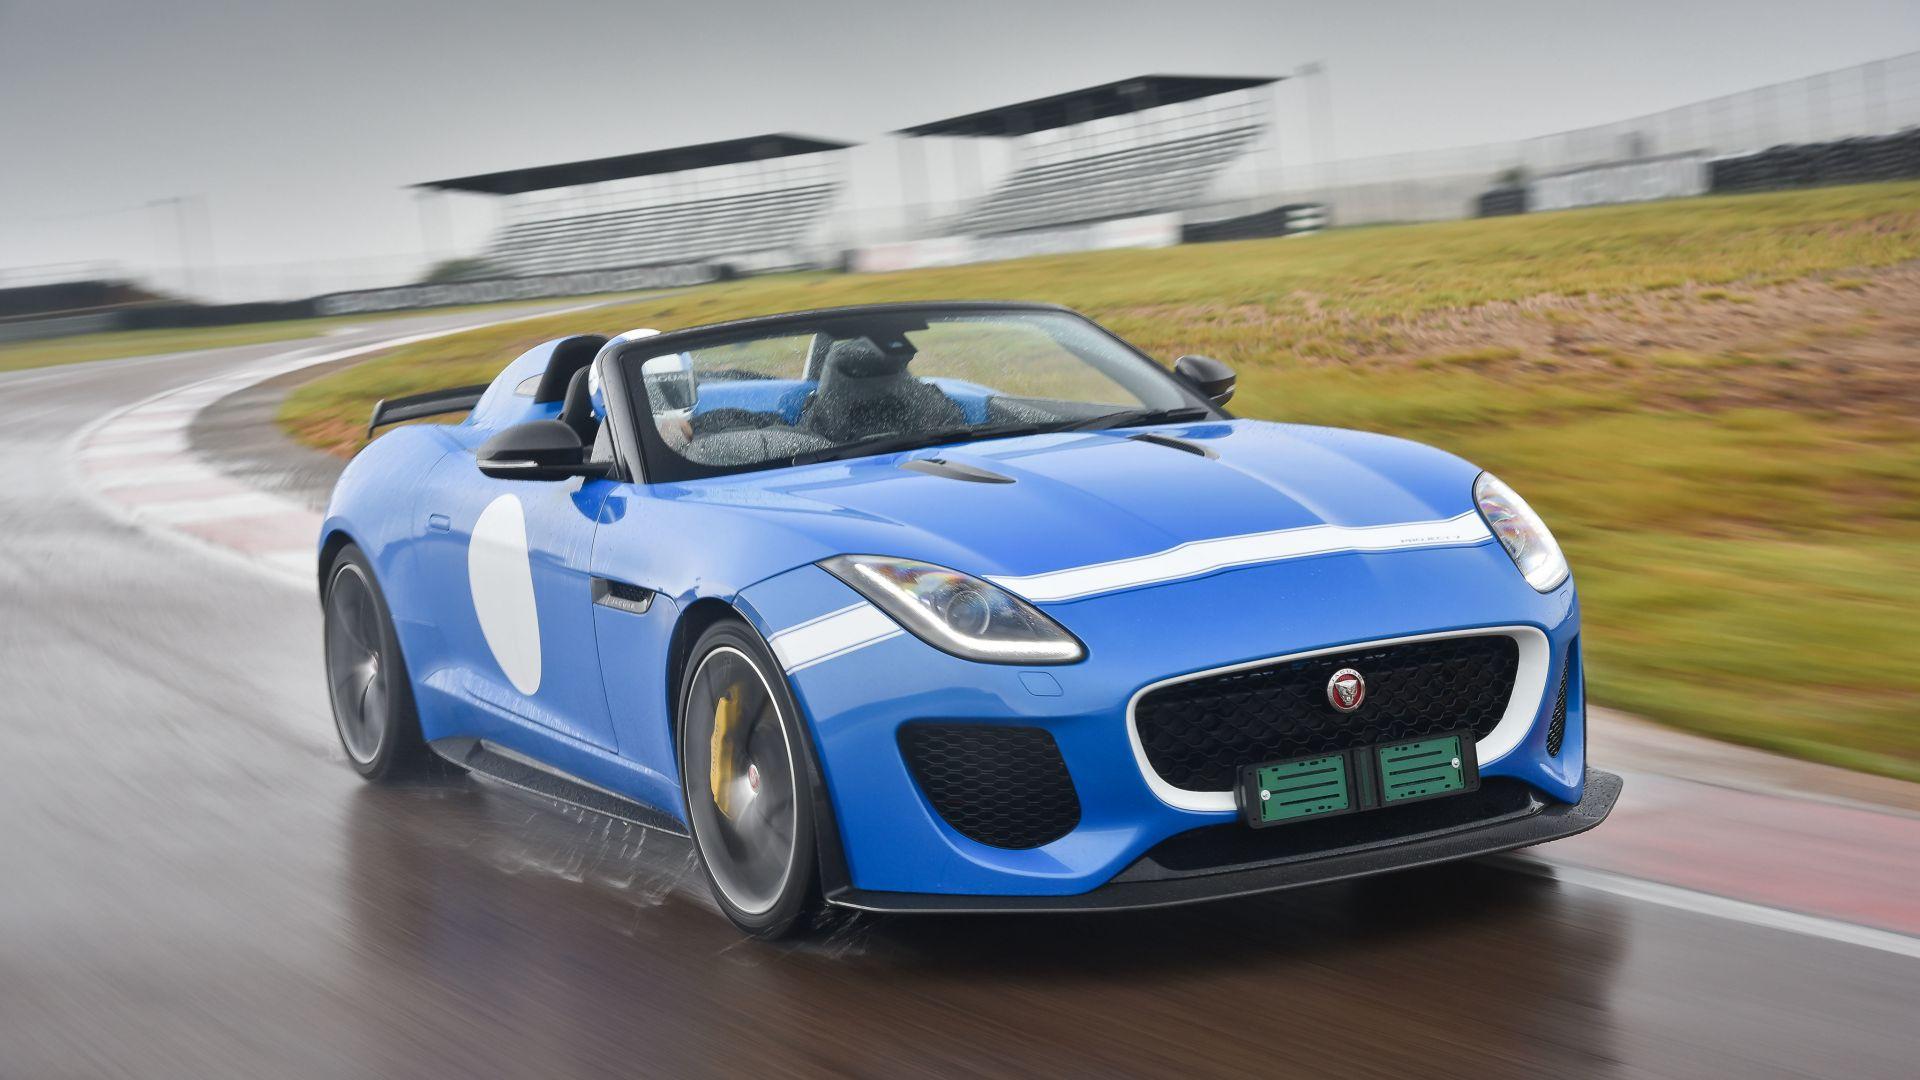 Wallpaper Jaguar F Type Project 7 Roadster Za Spec Blue